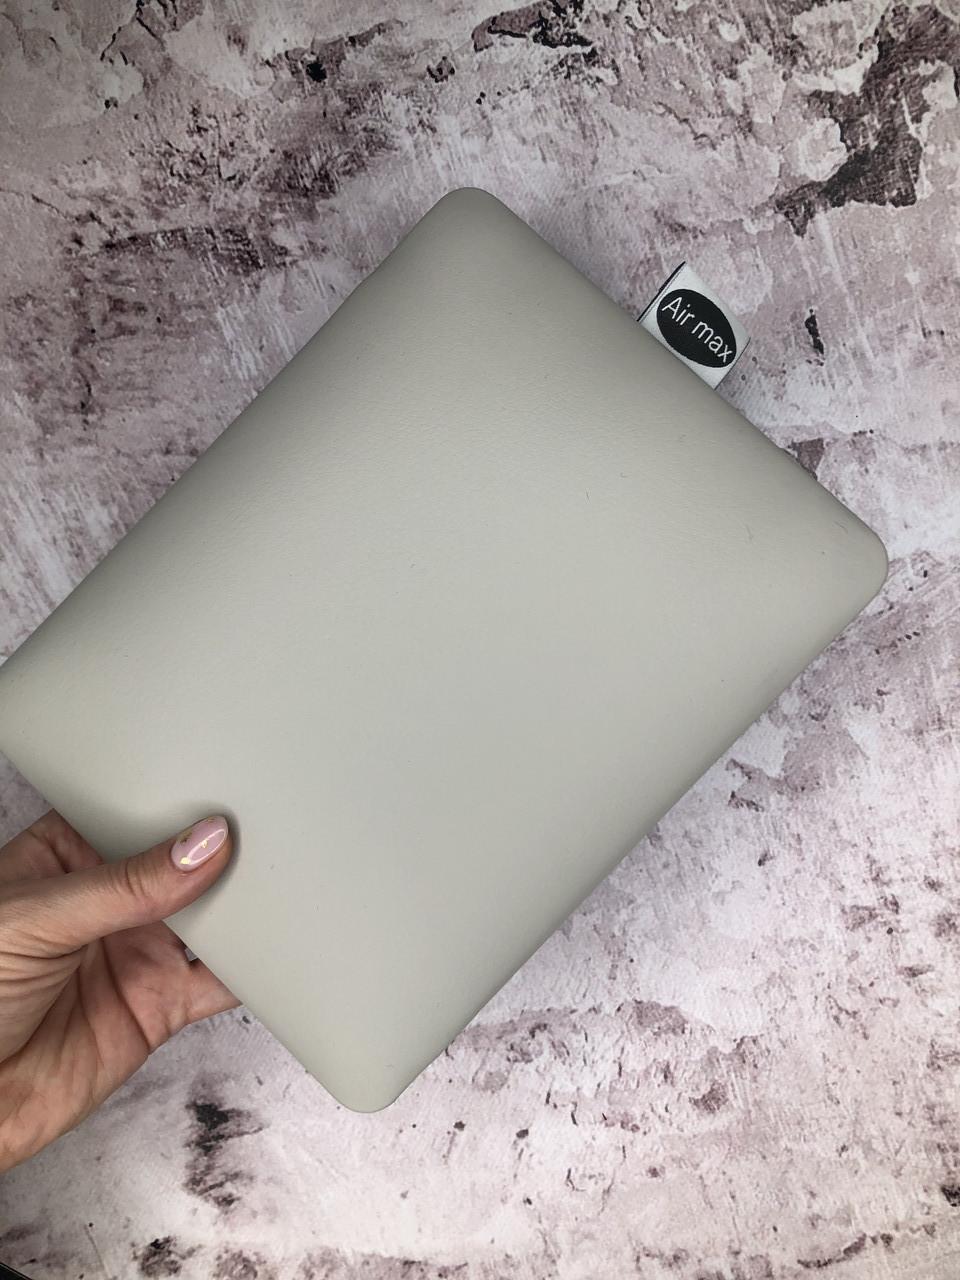 Защитный подлокотник Air max,цвет серый